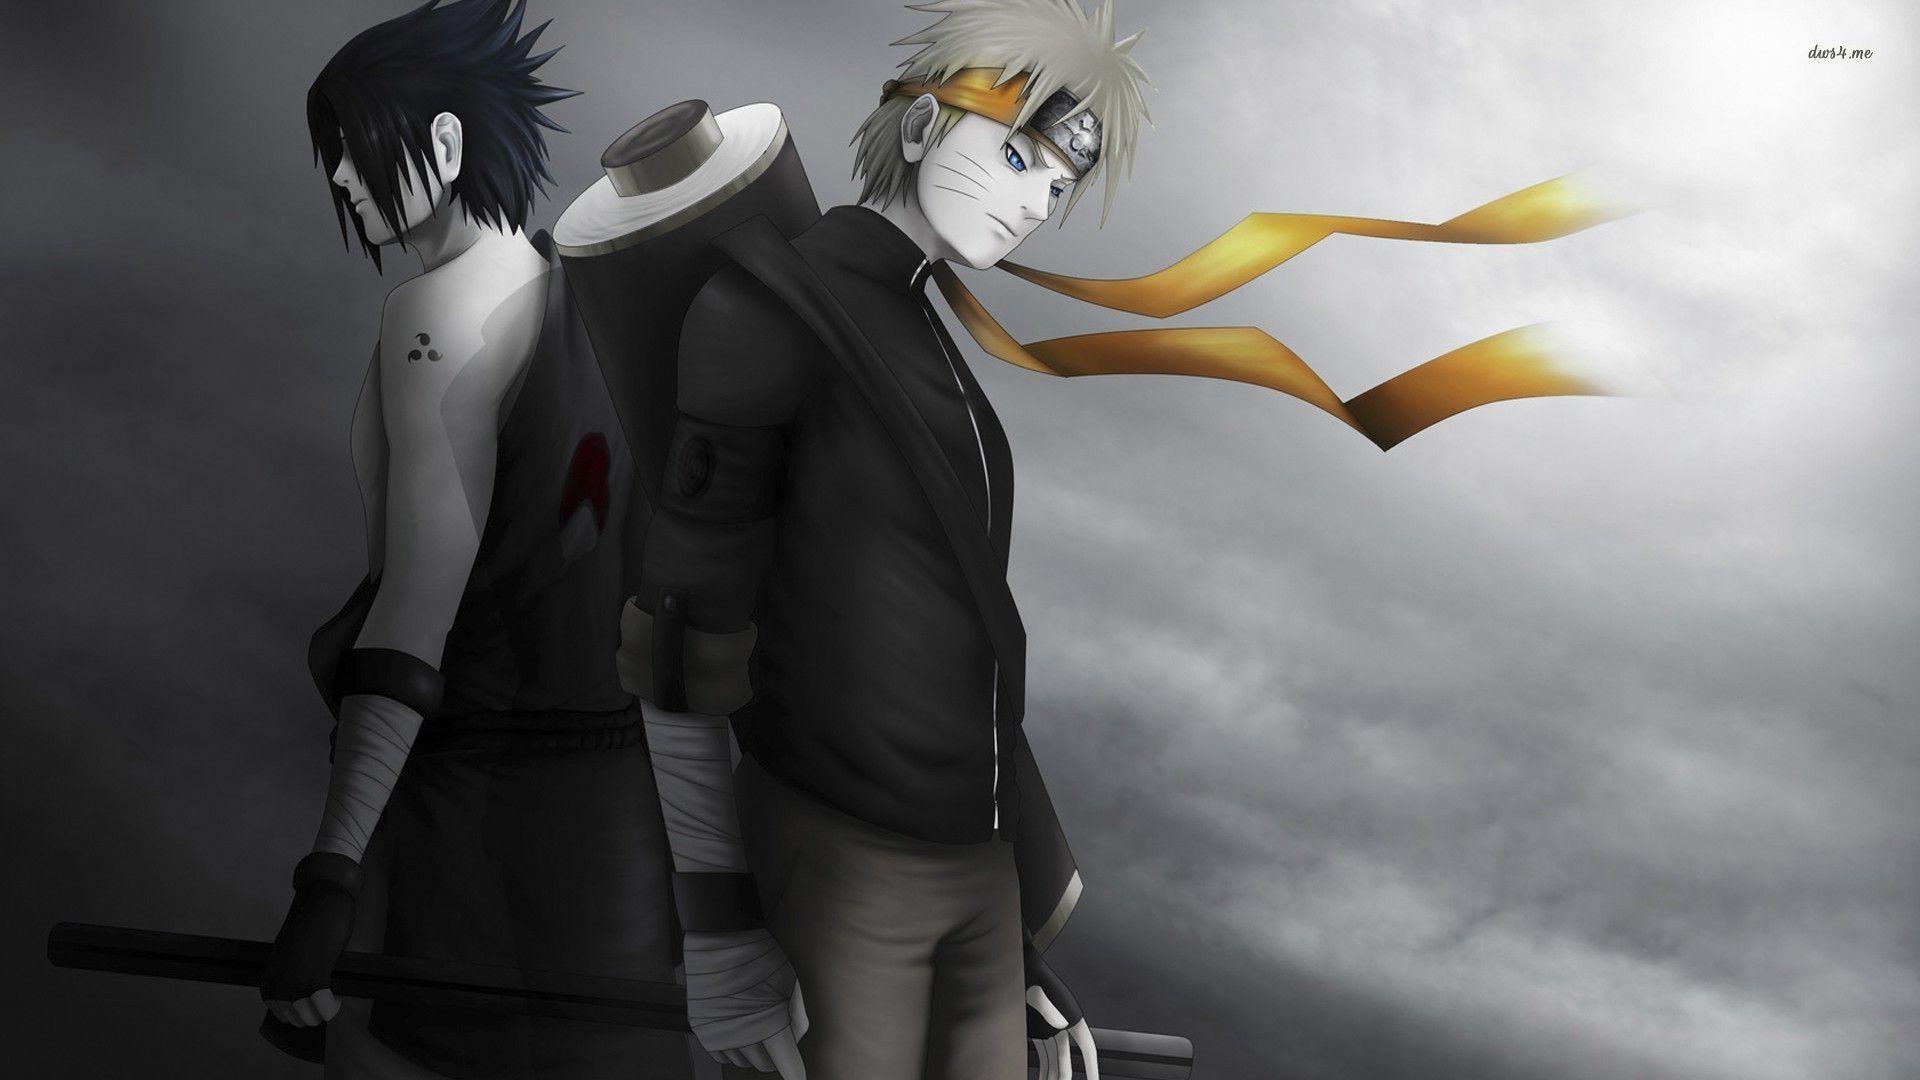 52+ Gambar Naruto Uzumaki Terlihat Keren